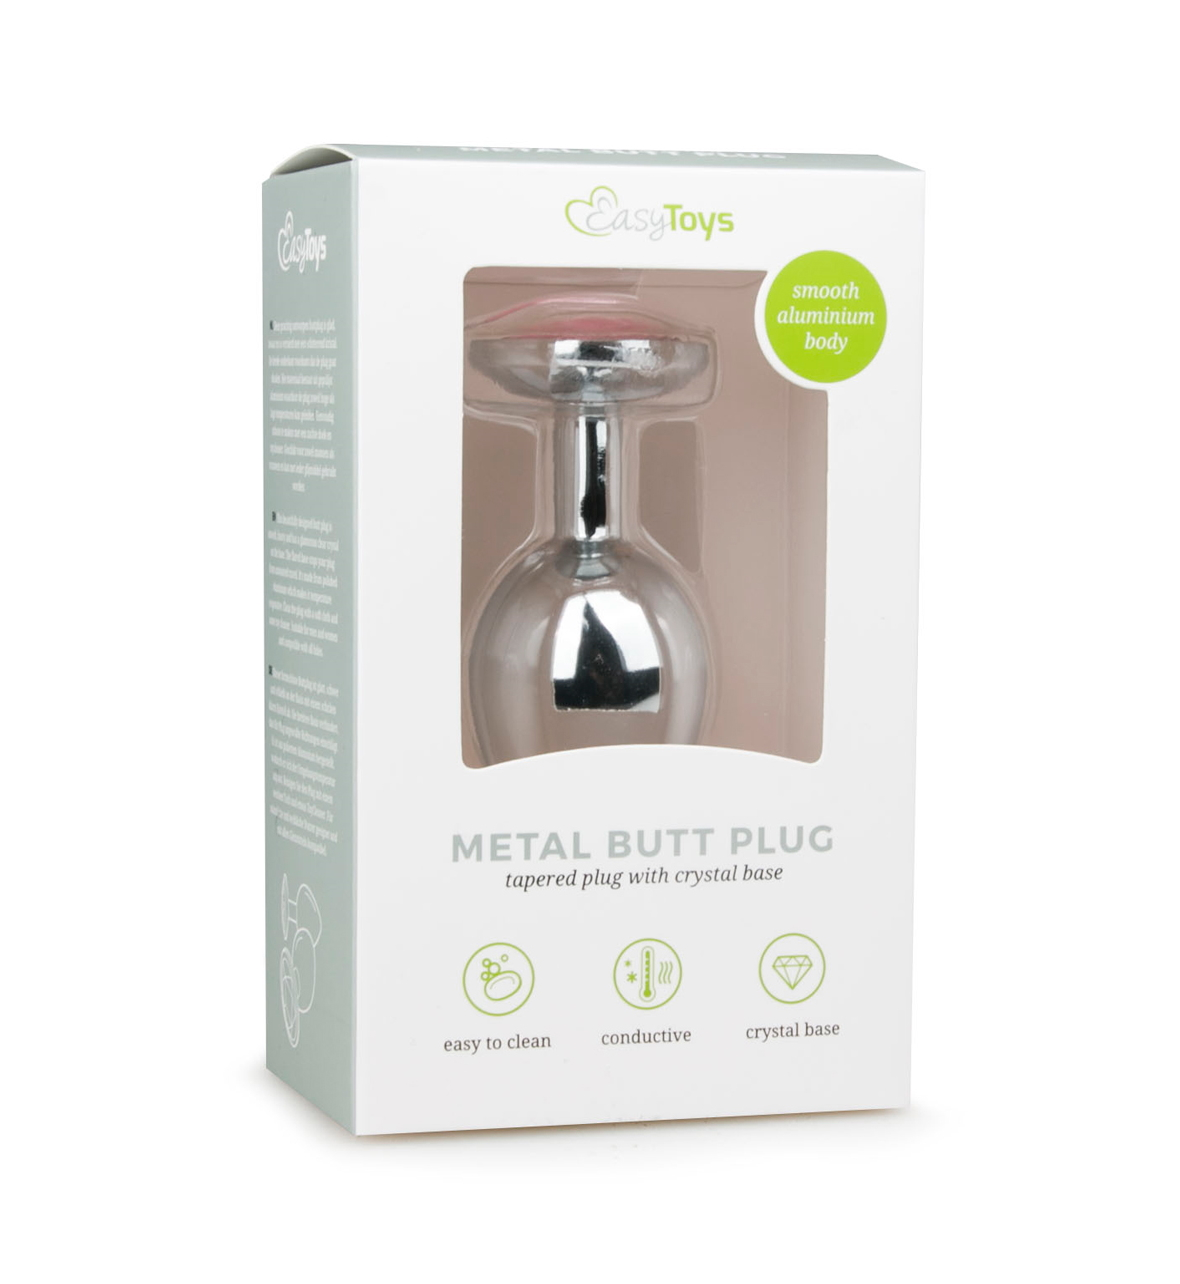 Metal Butt Plug, 8.4cm, cm, Silver/Rosa - Sølvfarget analplugg i metall - Easytoys